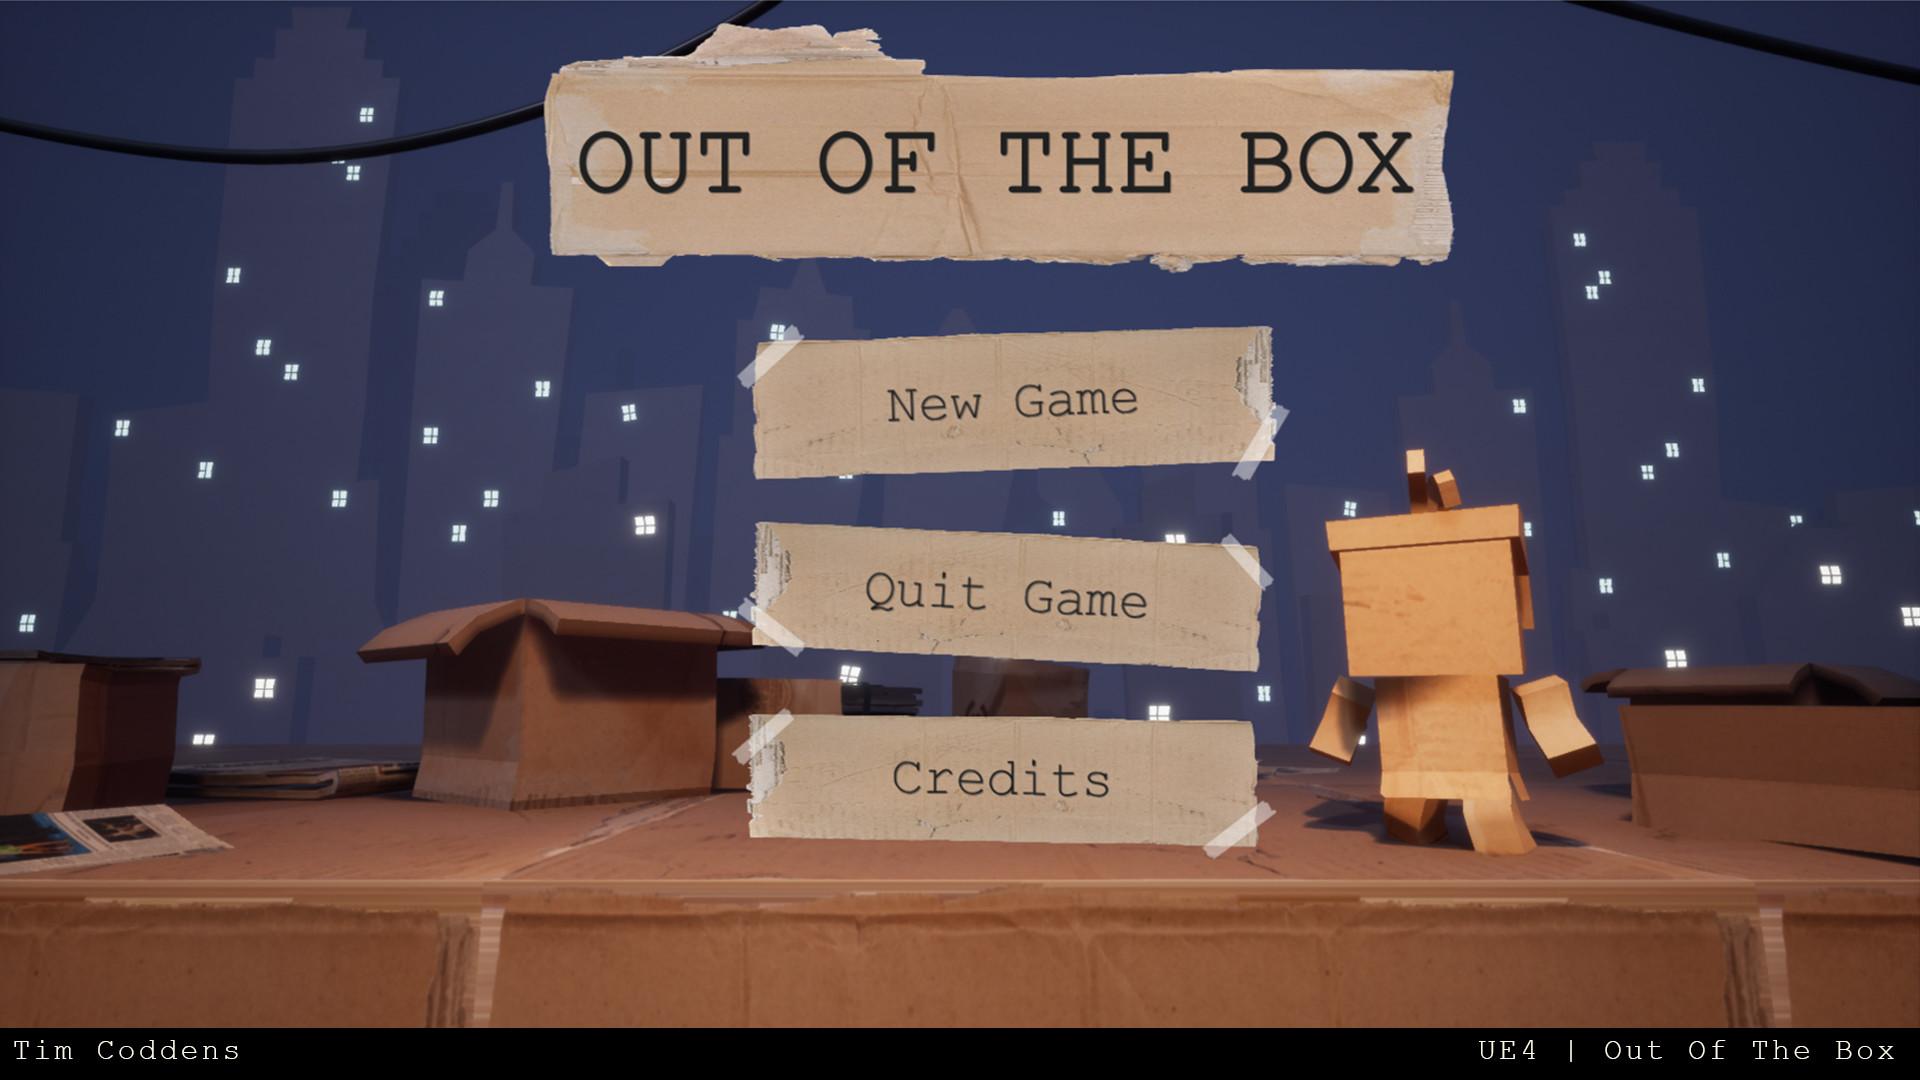 Tim coddens outofthebox 1